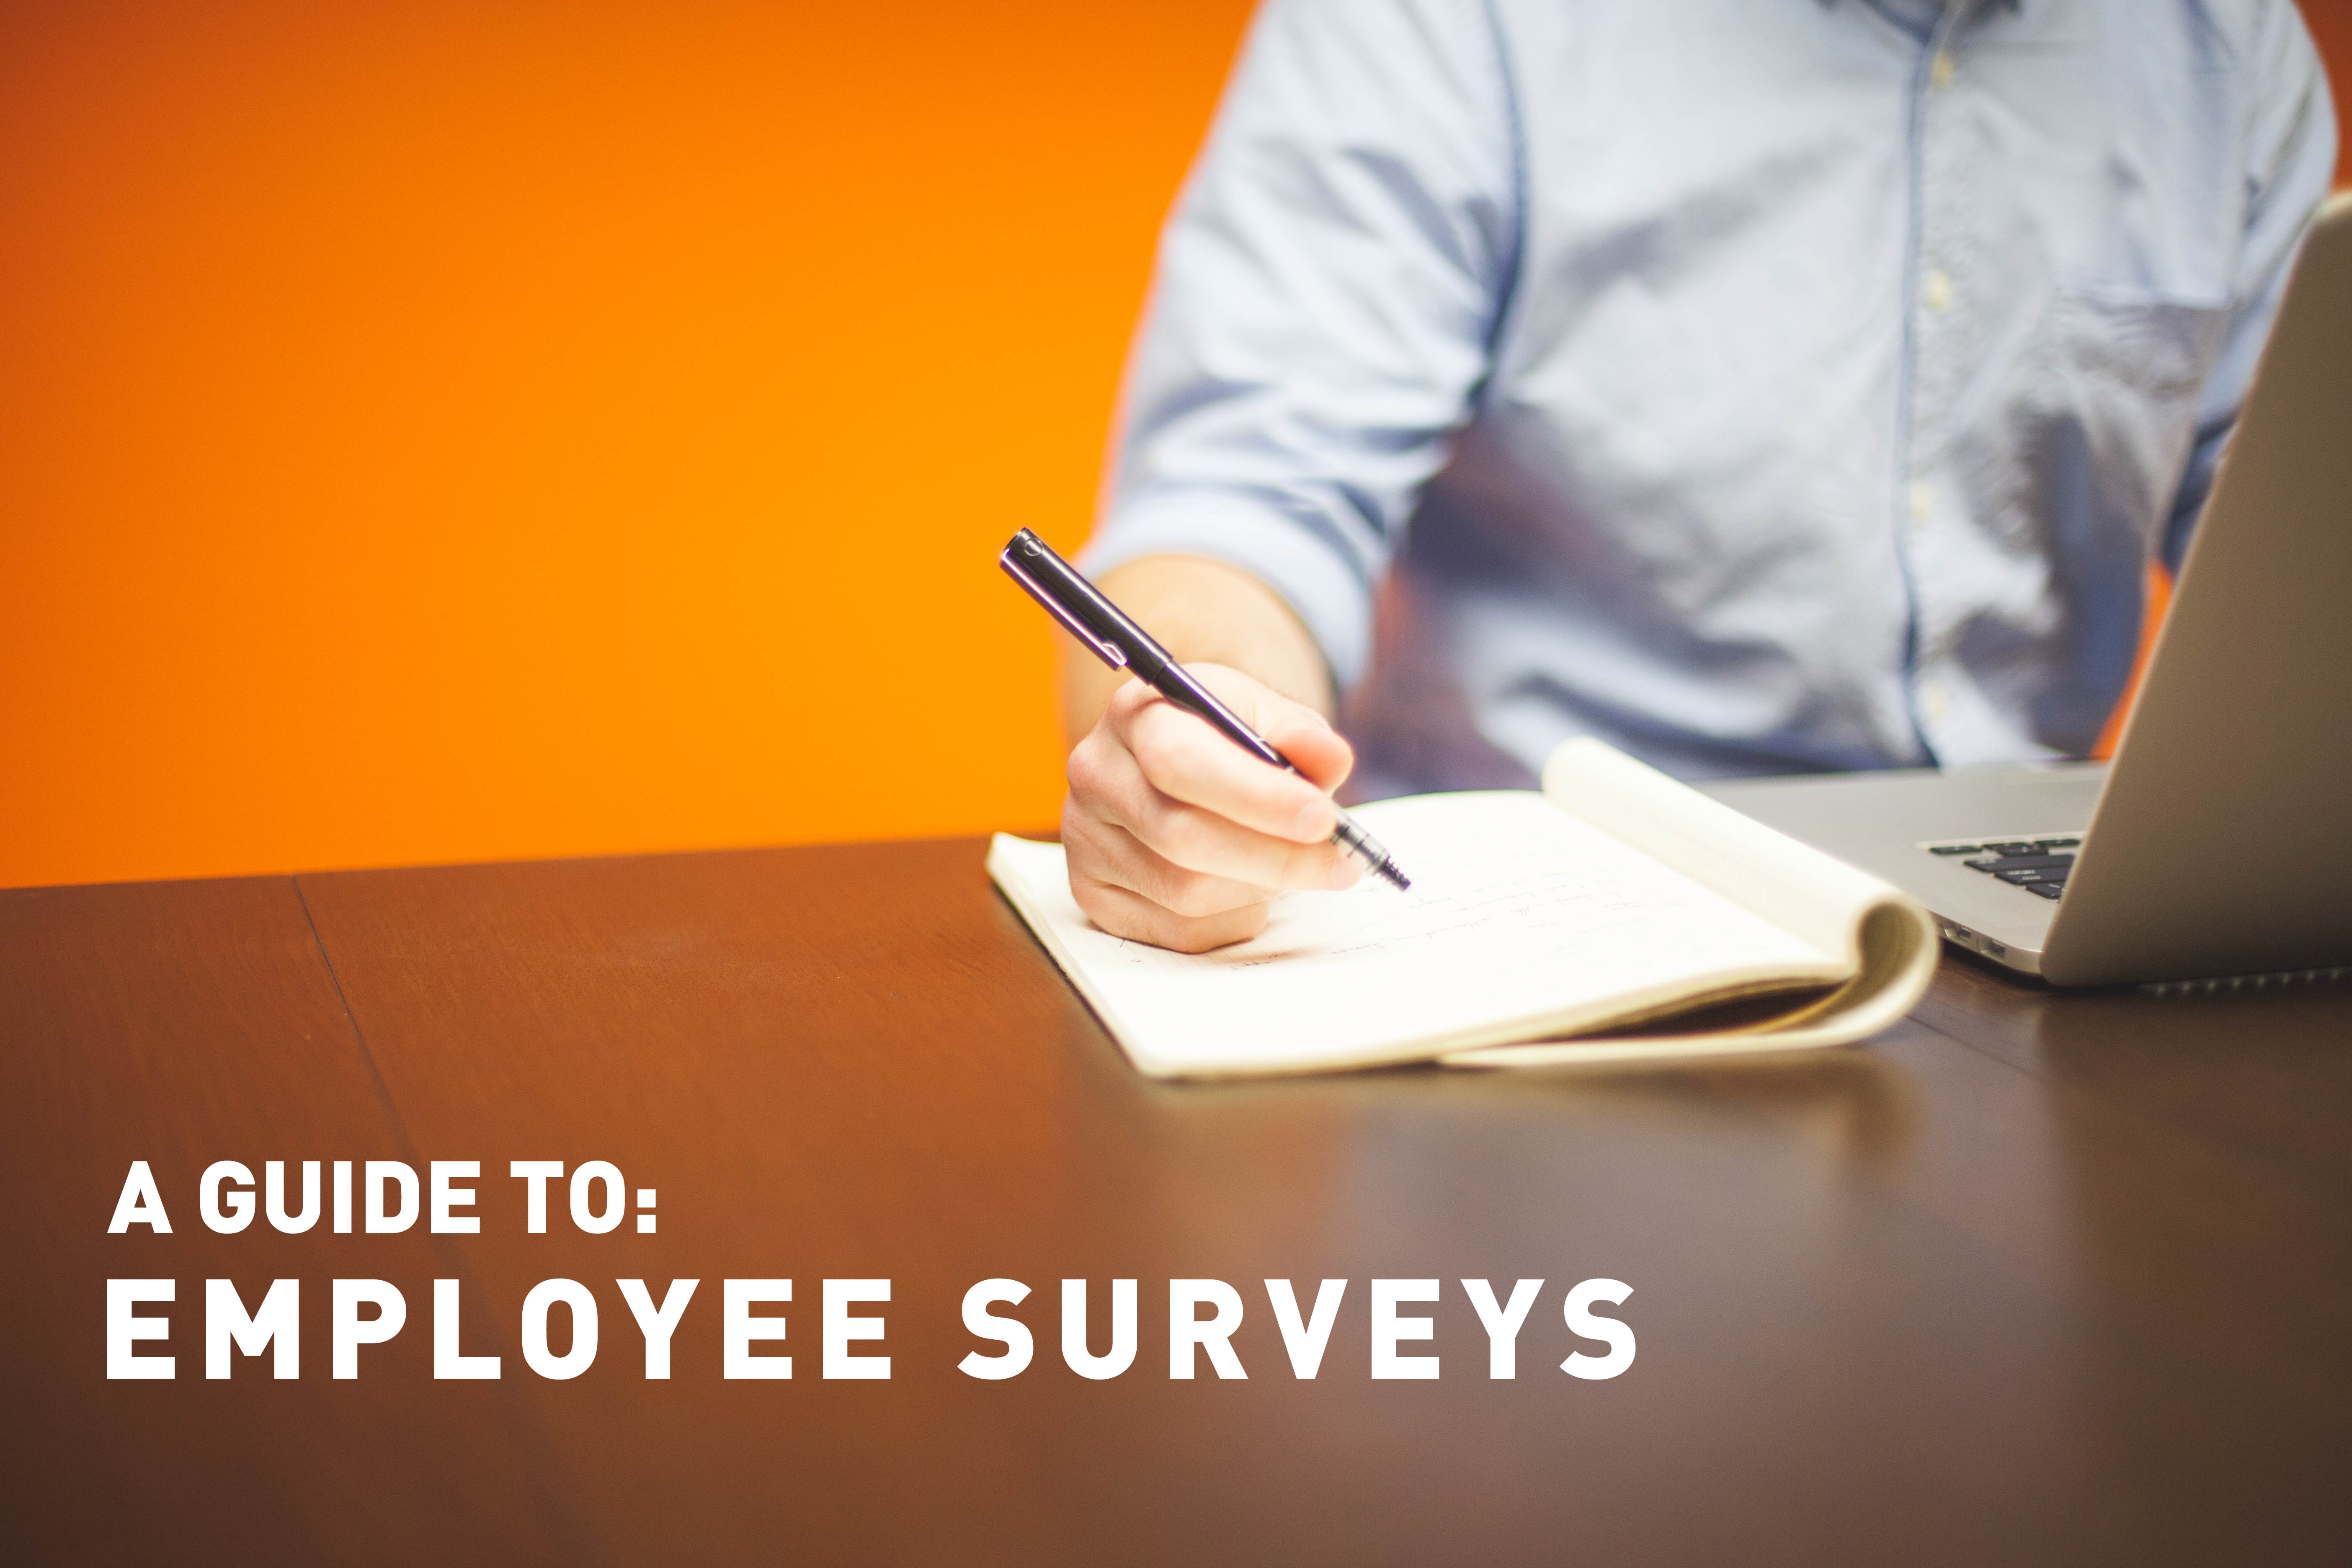 Guide_to_Employee_Surveys.jpg